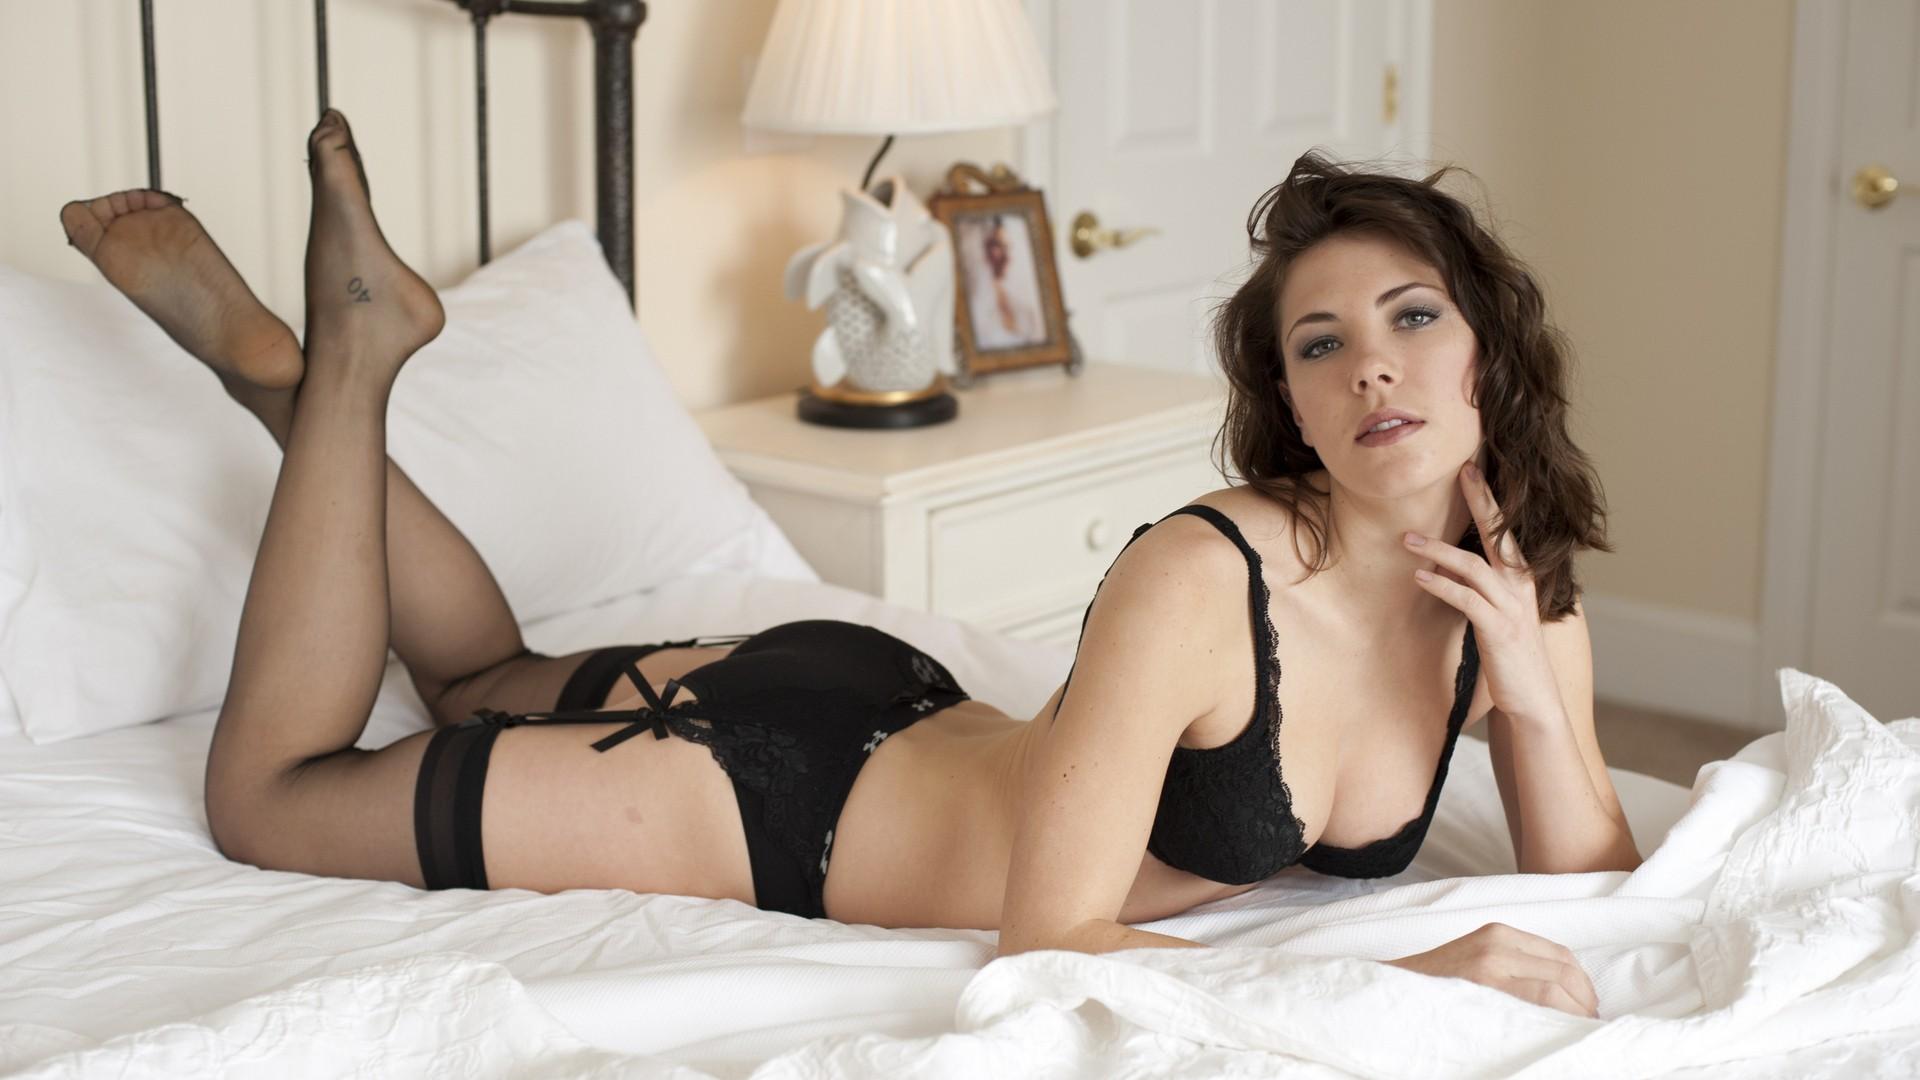 Super hot girls in lingerie